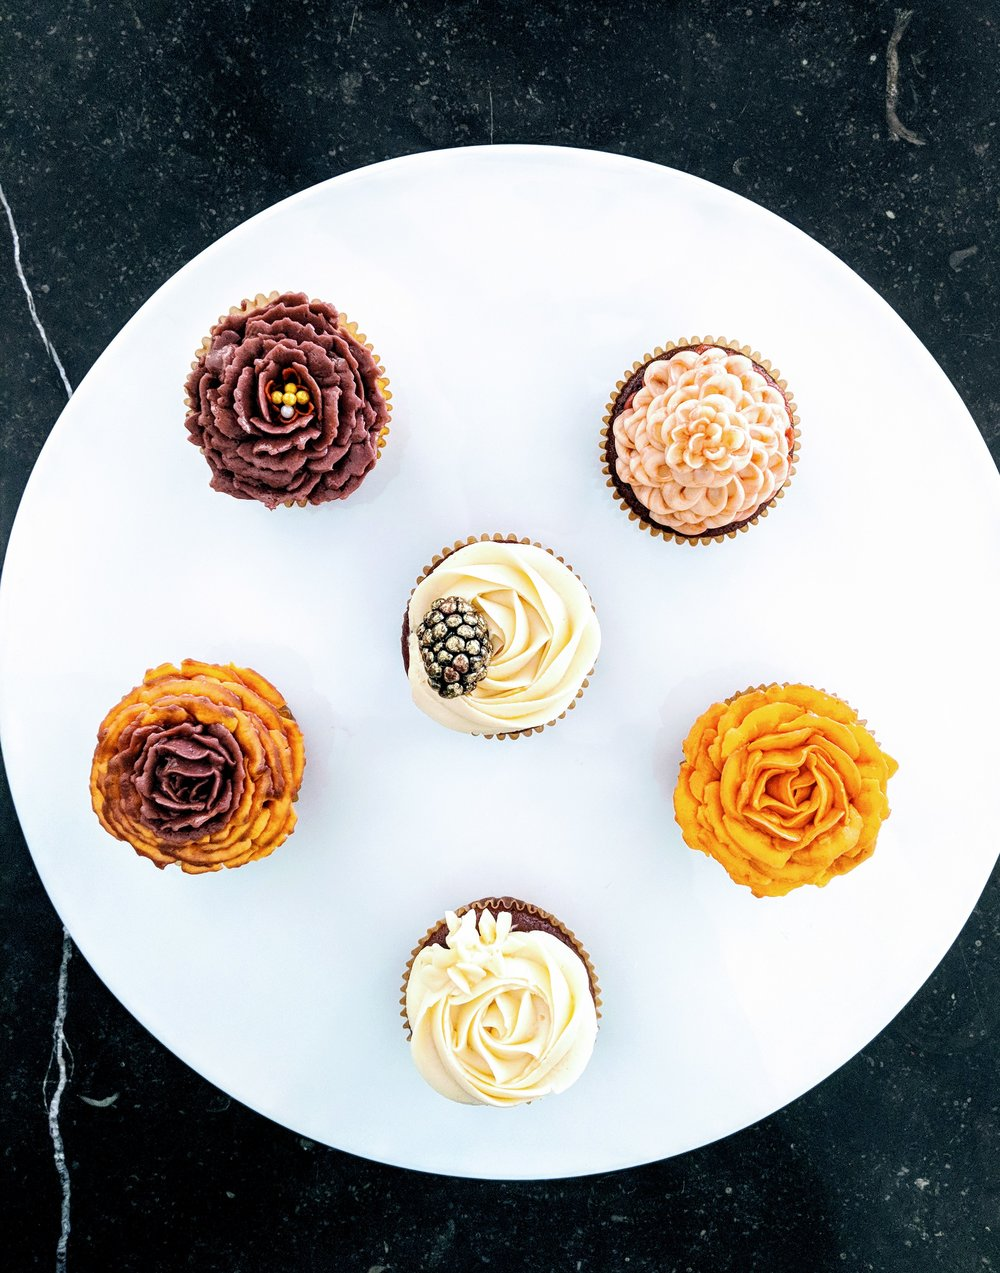 Decoration Petit Pot De Fleur sweet diplomacy - modern gluten-free patisserie & paleo bakery